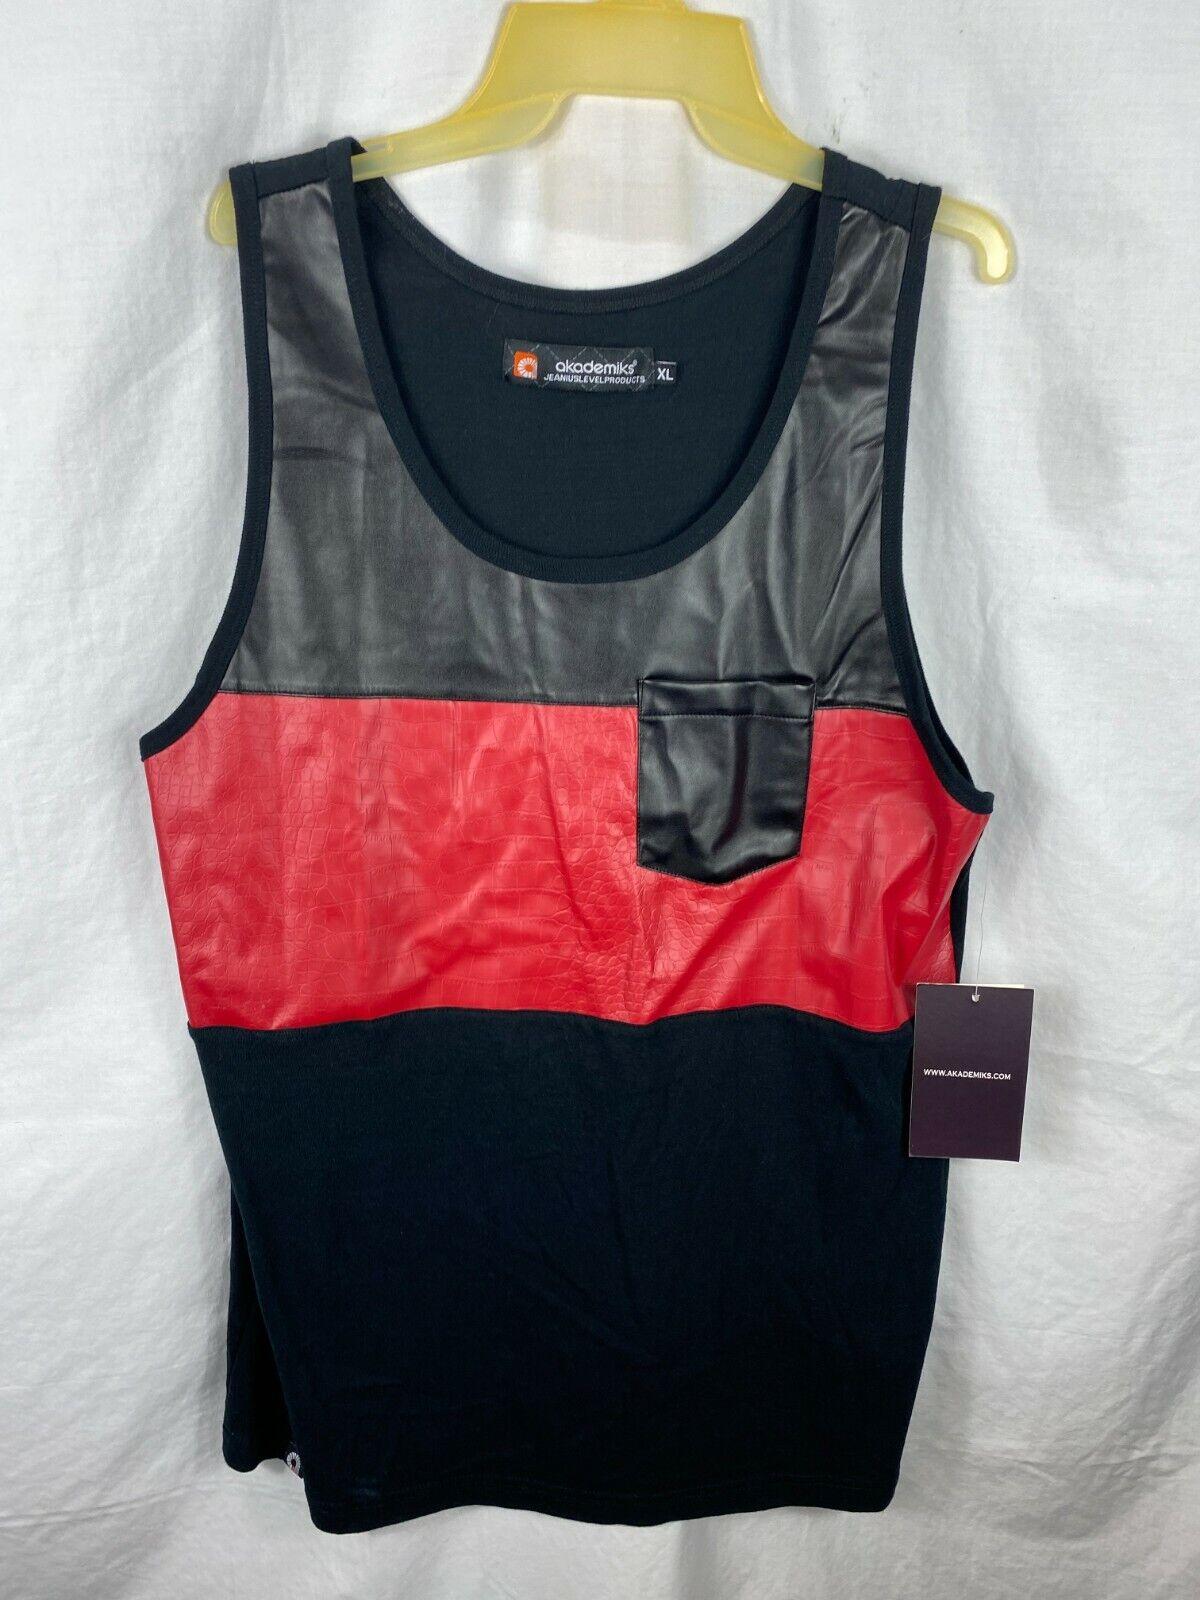 Akademiks Jeanius Level Men tank Top Shirt Black Red Size XL Pocket Gator NWT